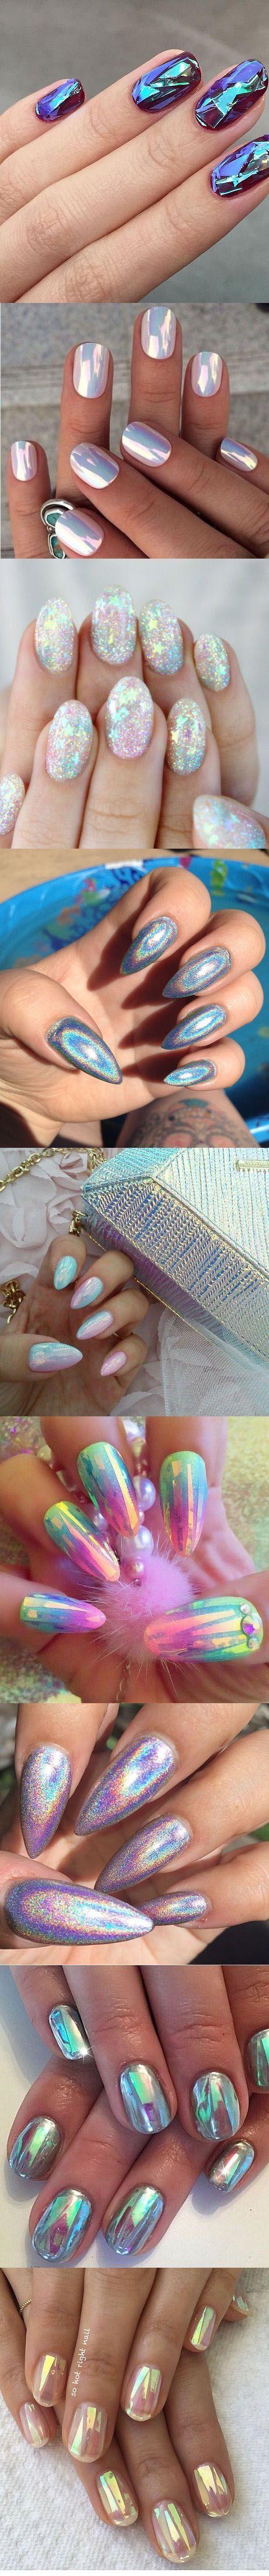 Celestial nails nail art